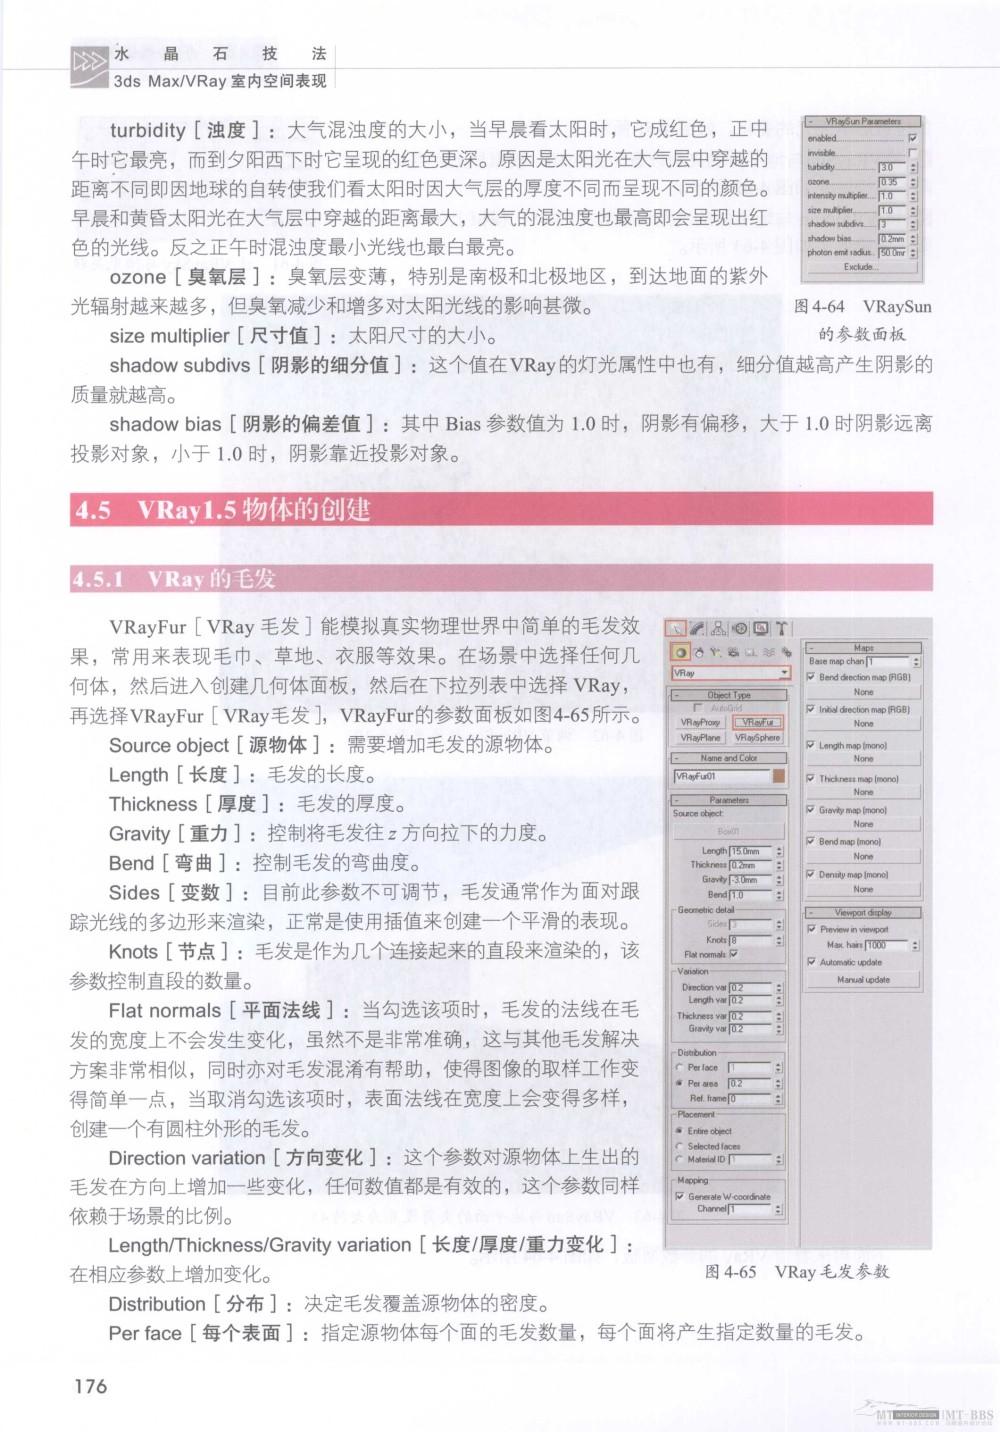 水晶石技法-3ds_Max&VRay室内空间表现_水晶石技法-3ds_Max&VRay室内空间表现_页面_182.jpg